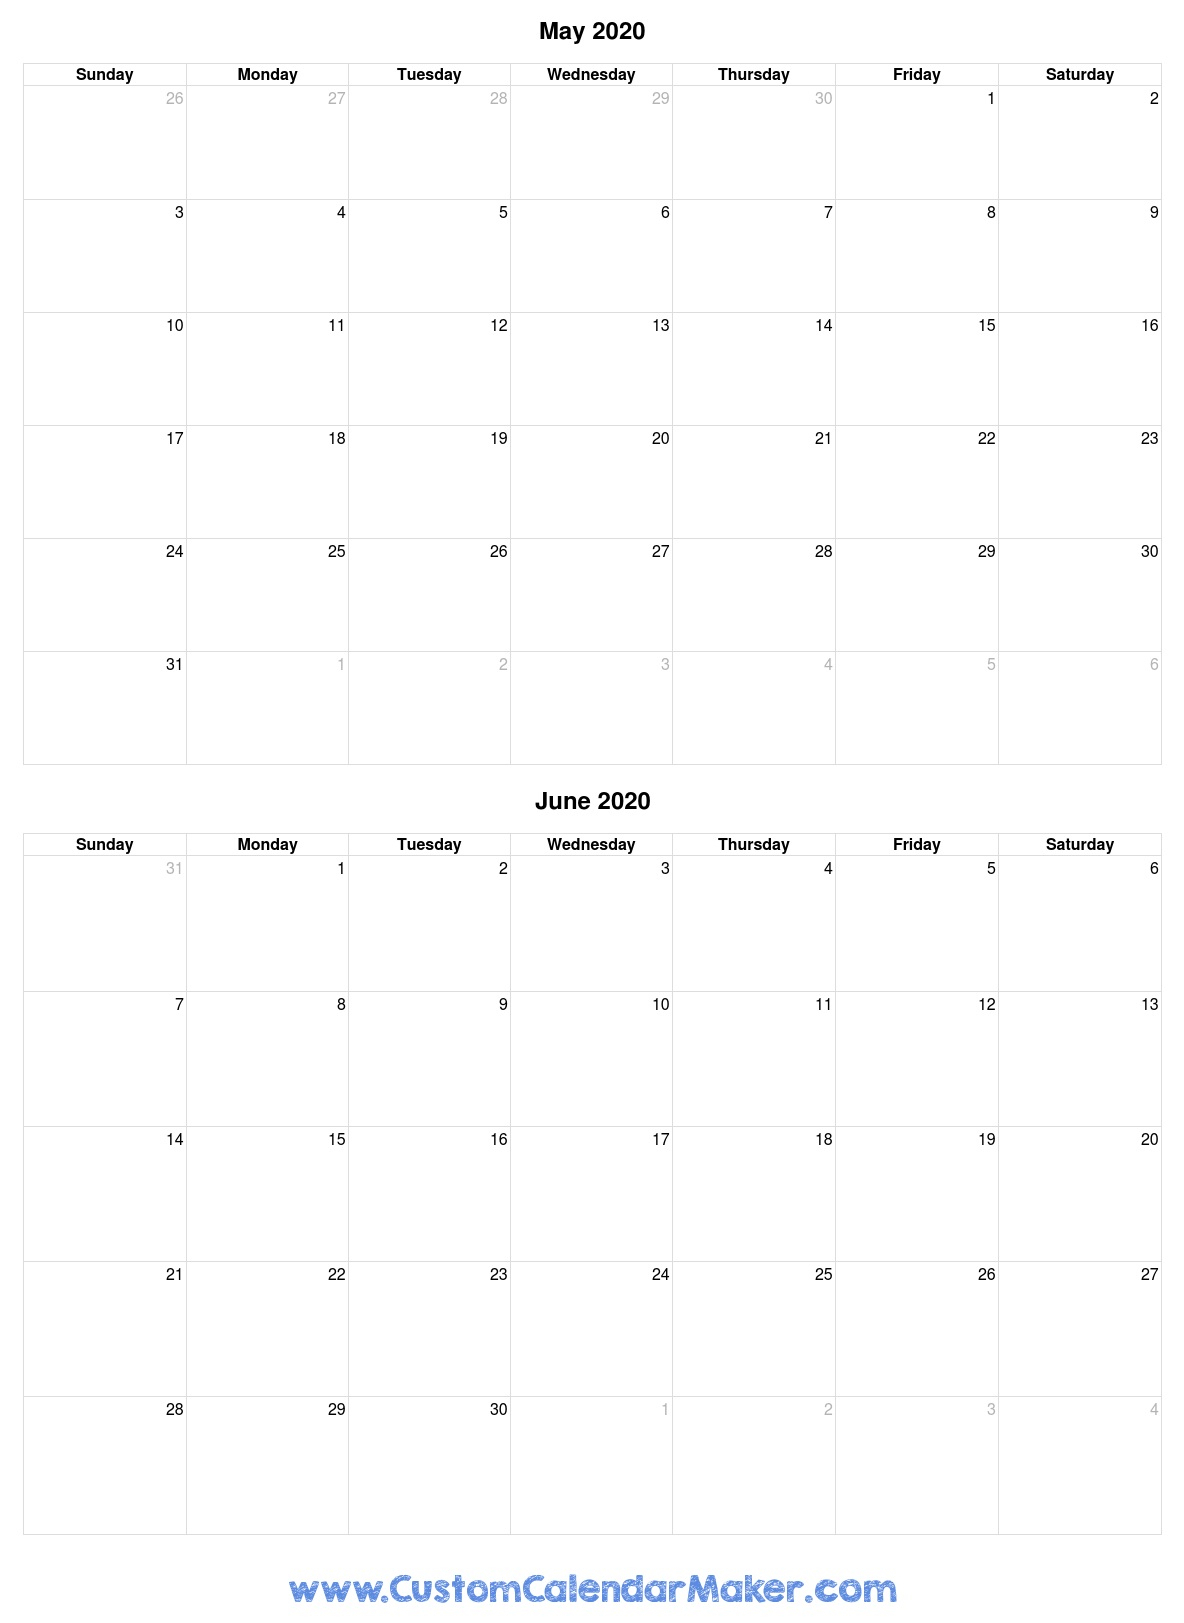 Free Printable Calendars, Blank Pdf Templates To Print A